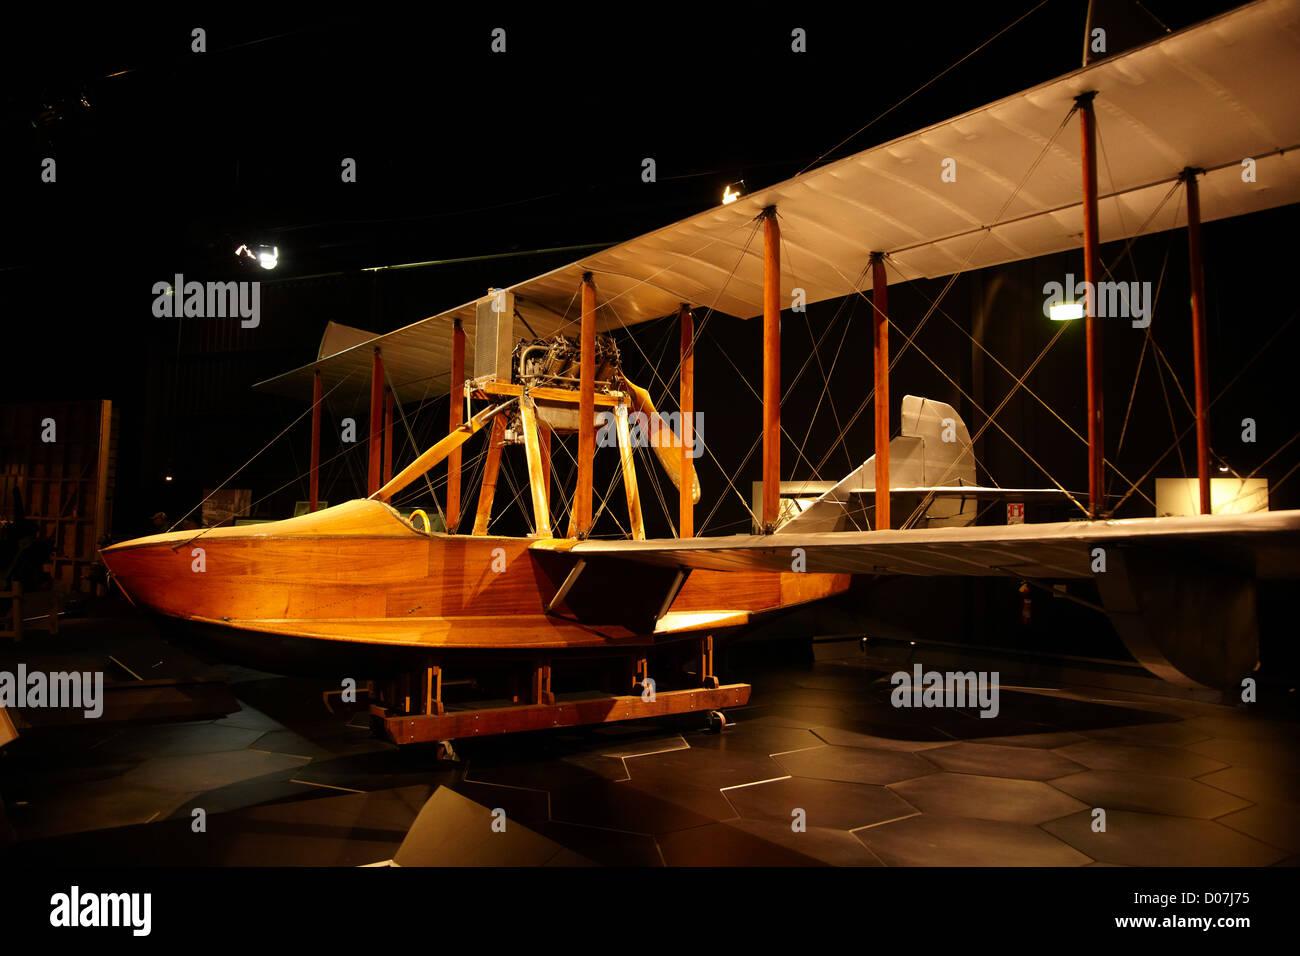 Curtiss MF Flying Boat biplane, Omaka Aviation Heritage Centre, Blenheim, Marlborough, South Island, New Zealand - Stock Image